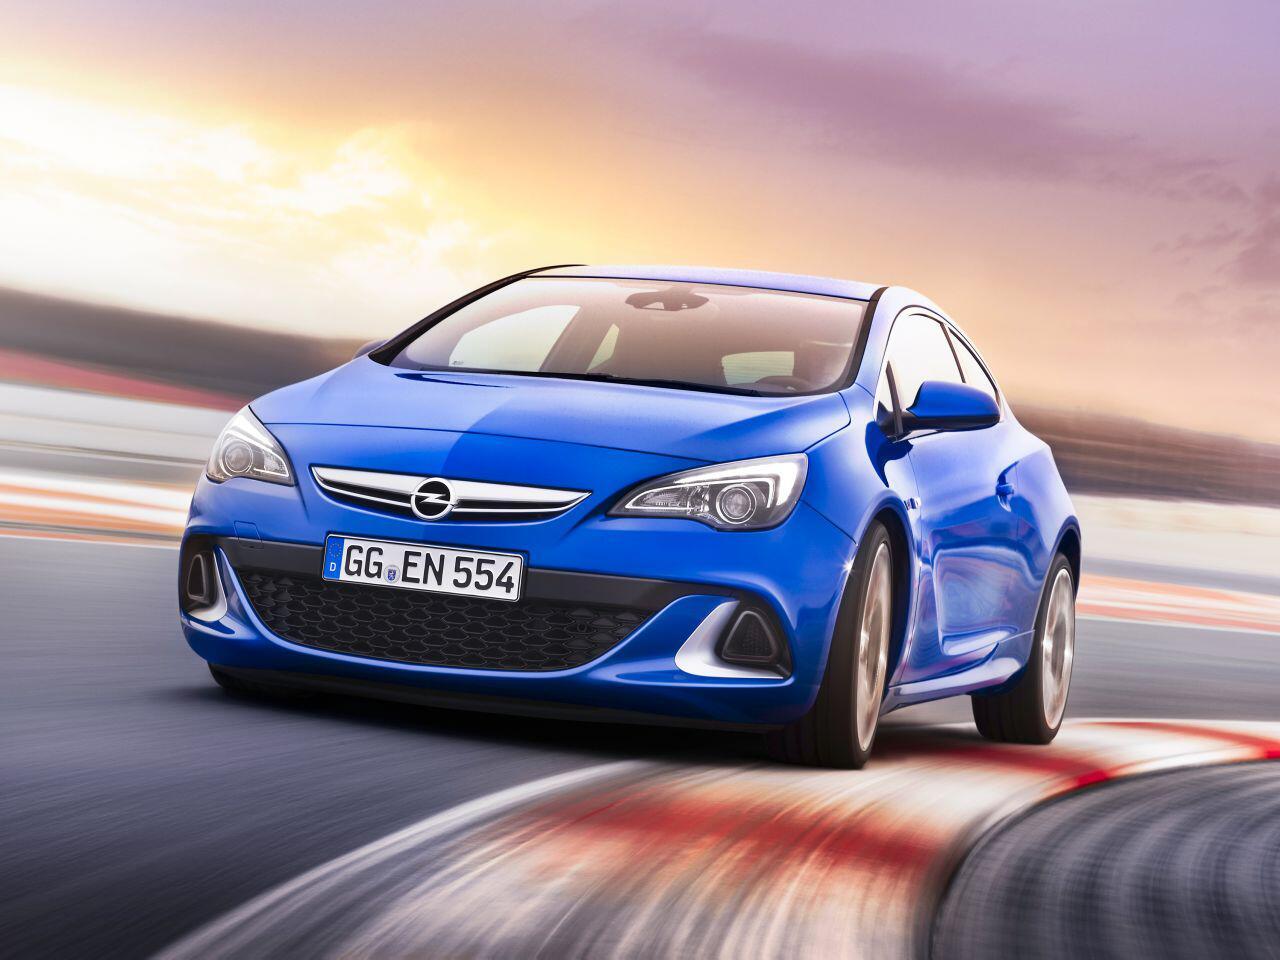 Bild zu 7. Platz: Opel Astra OPC